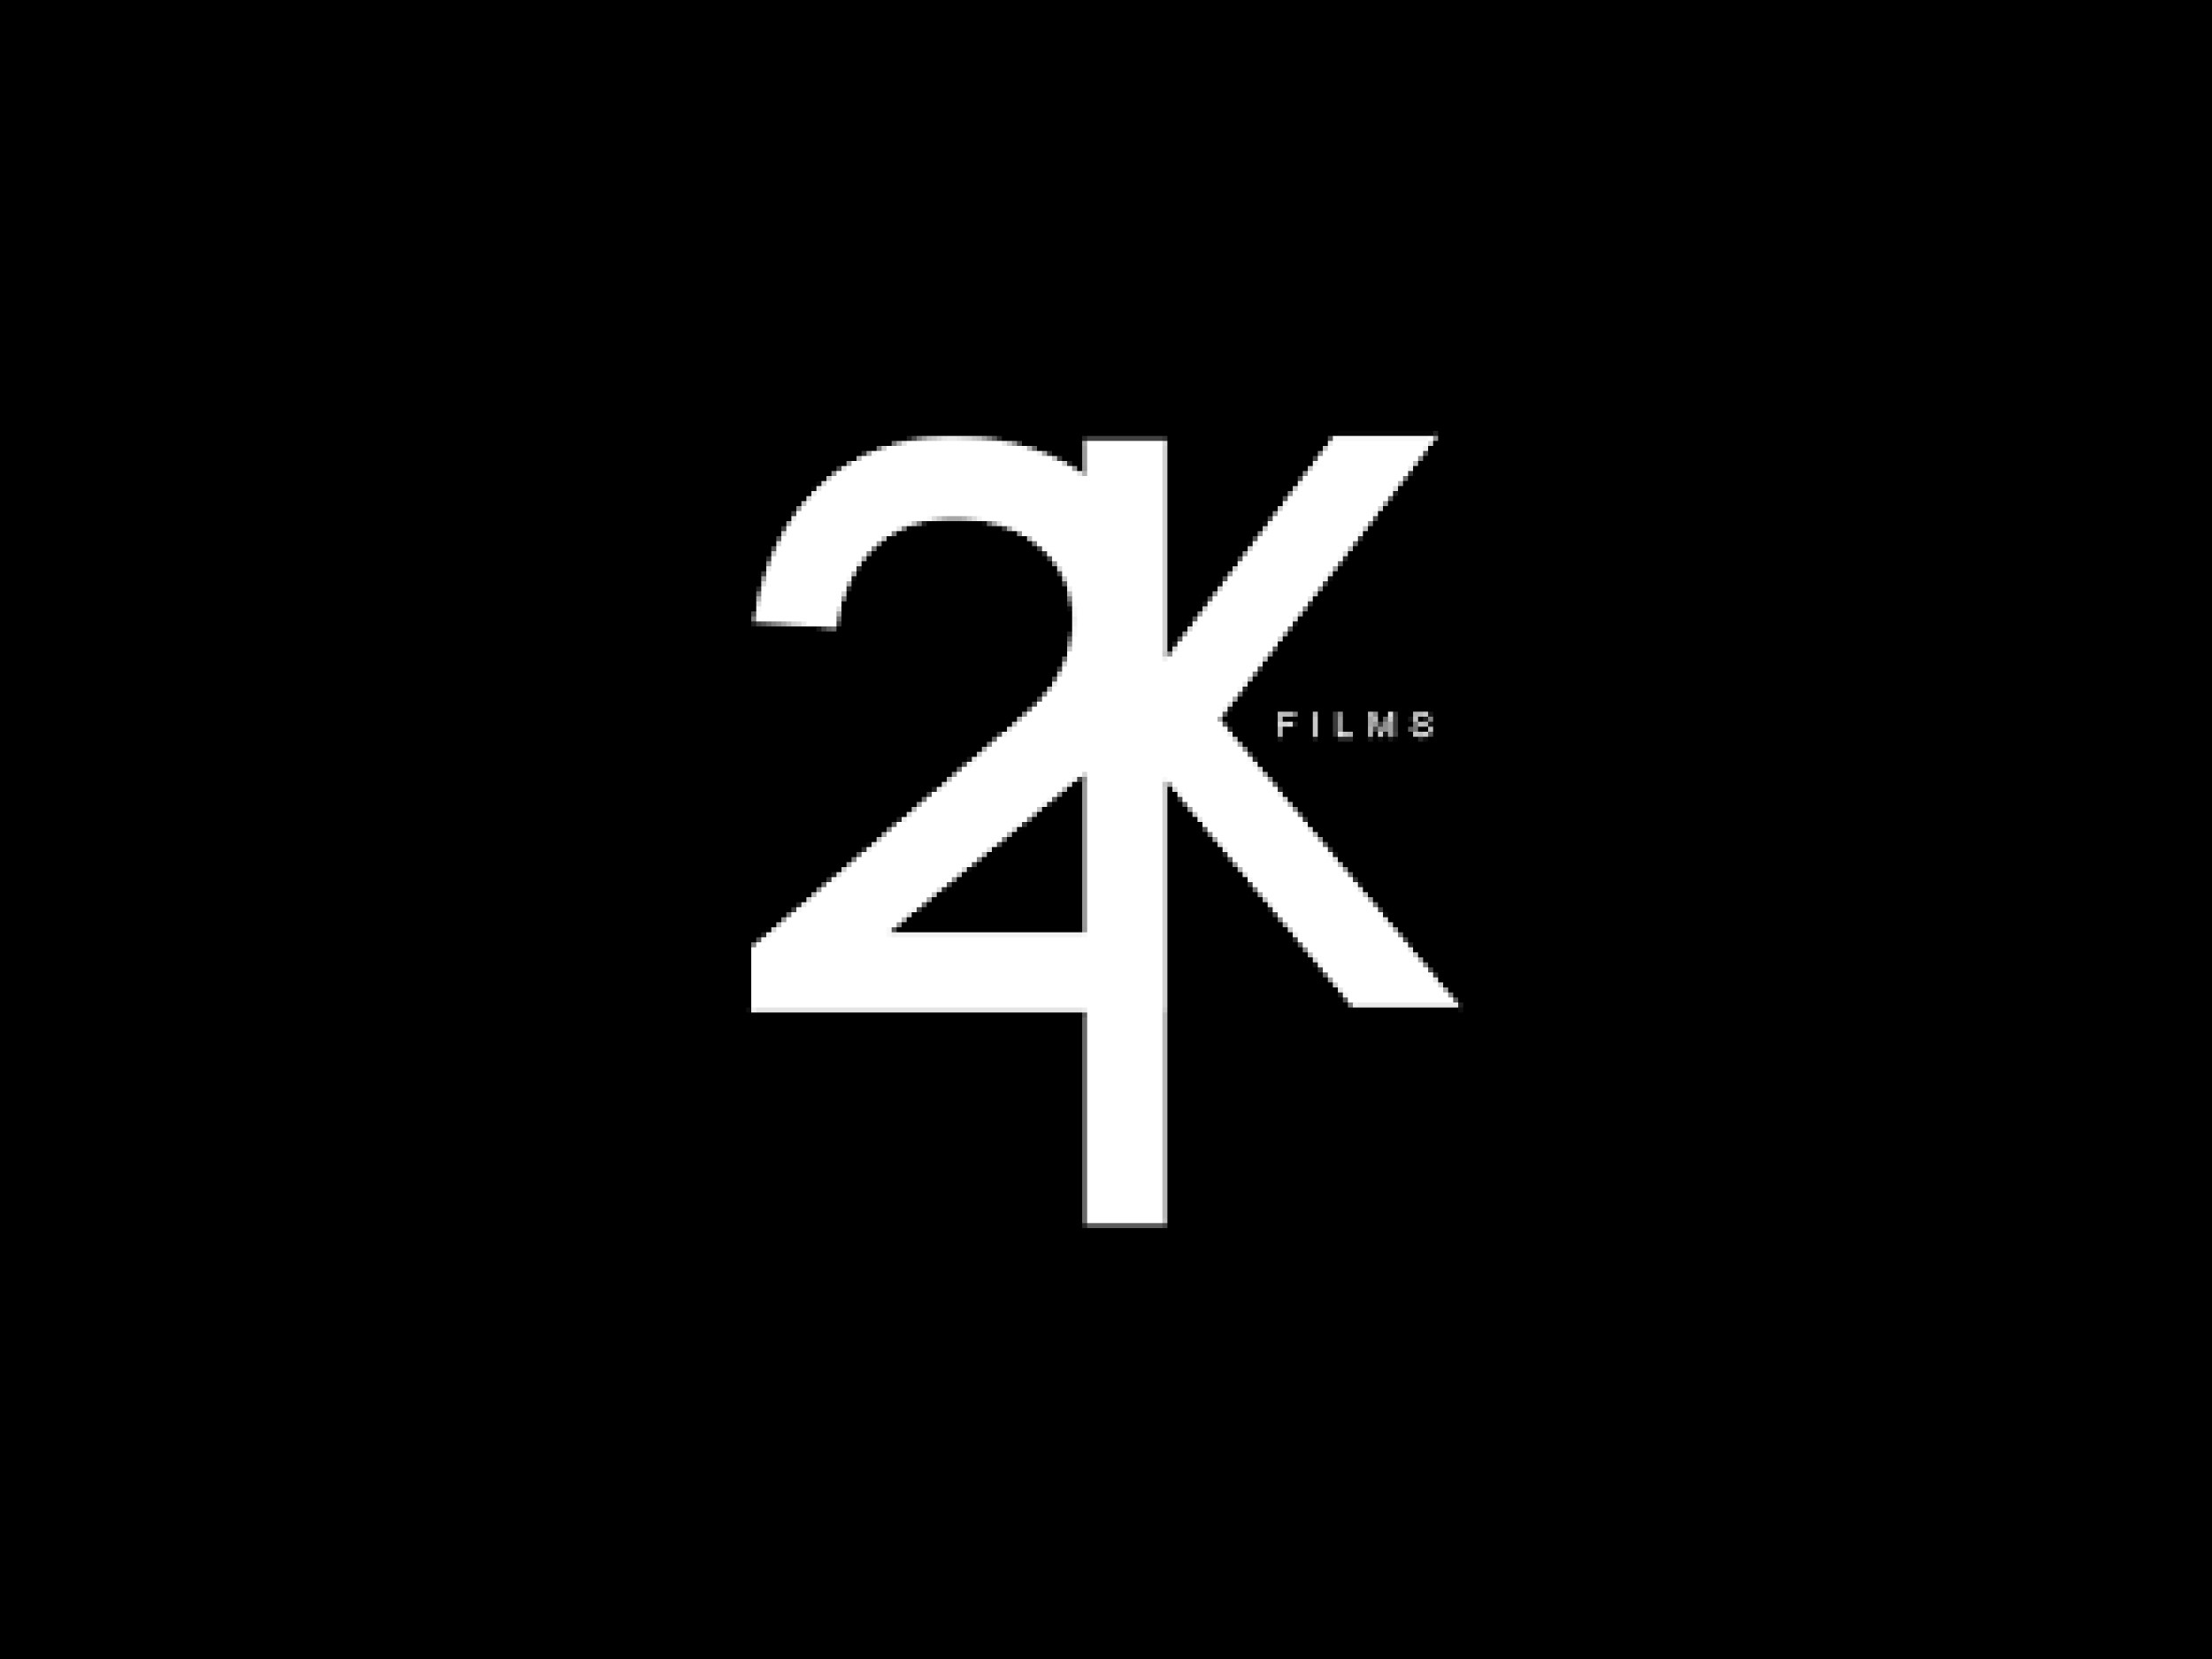 2k films 3